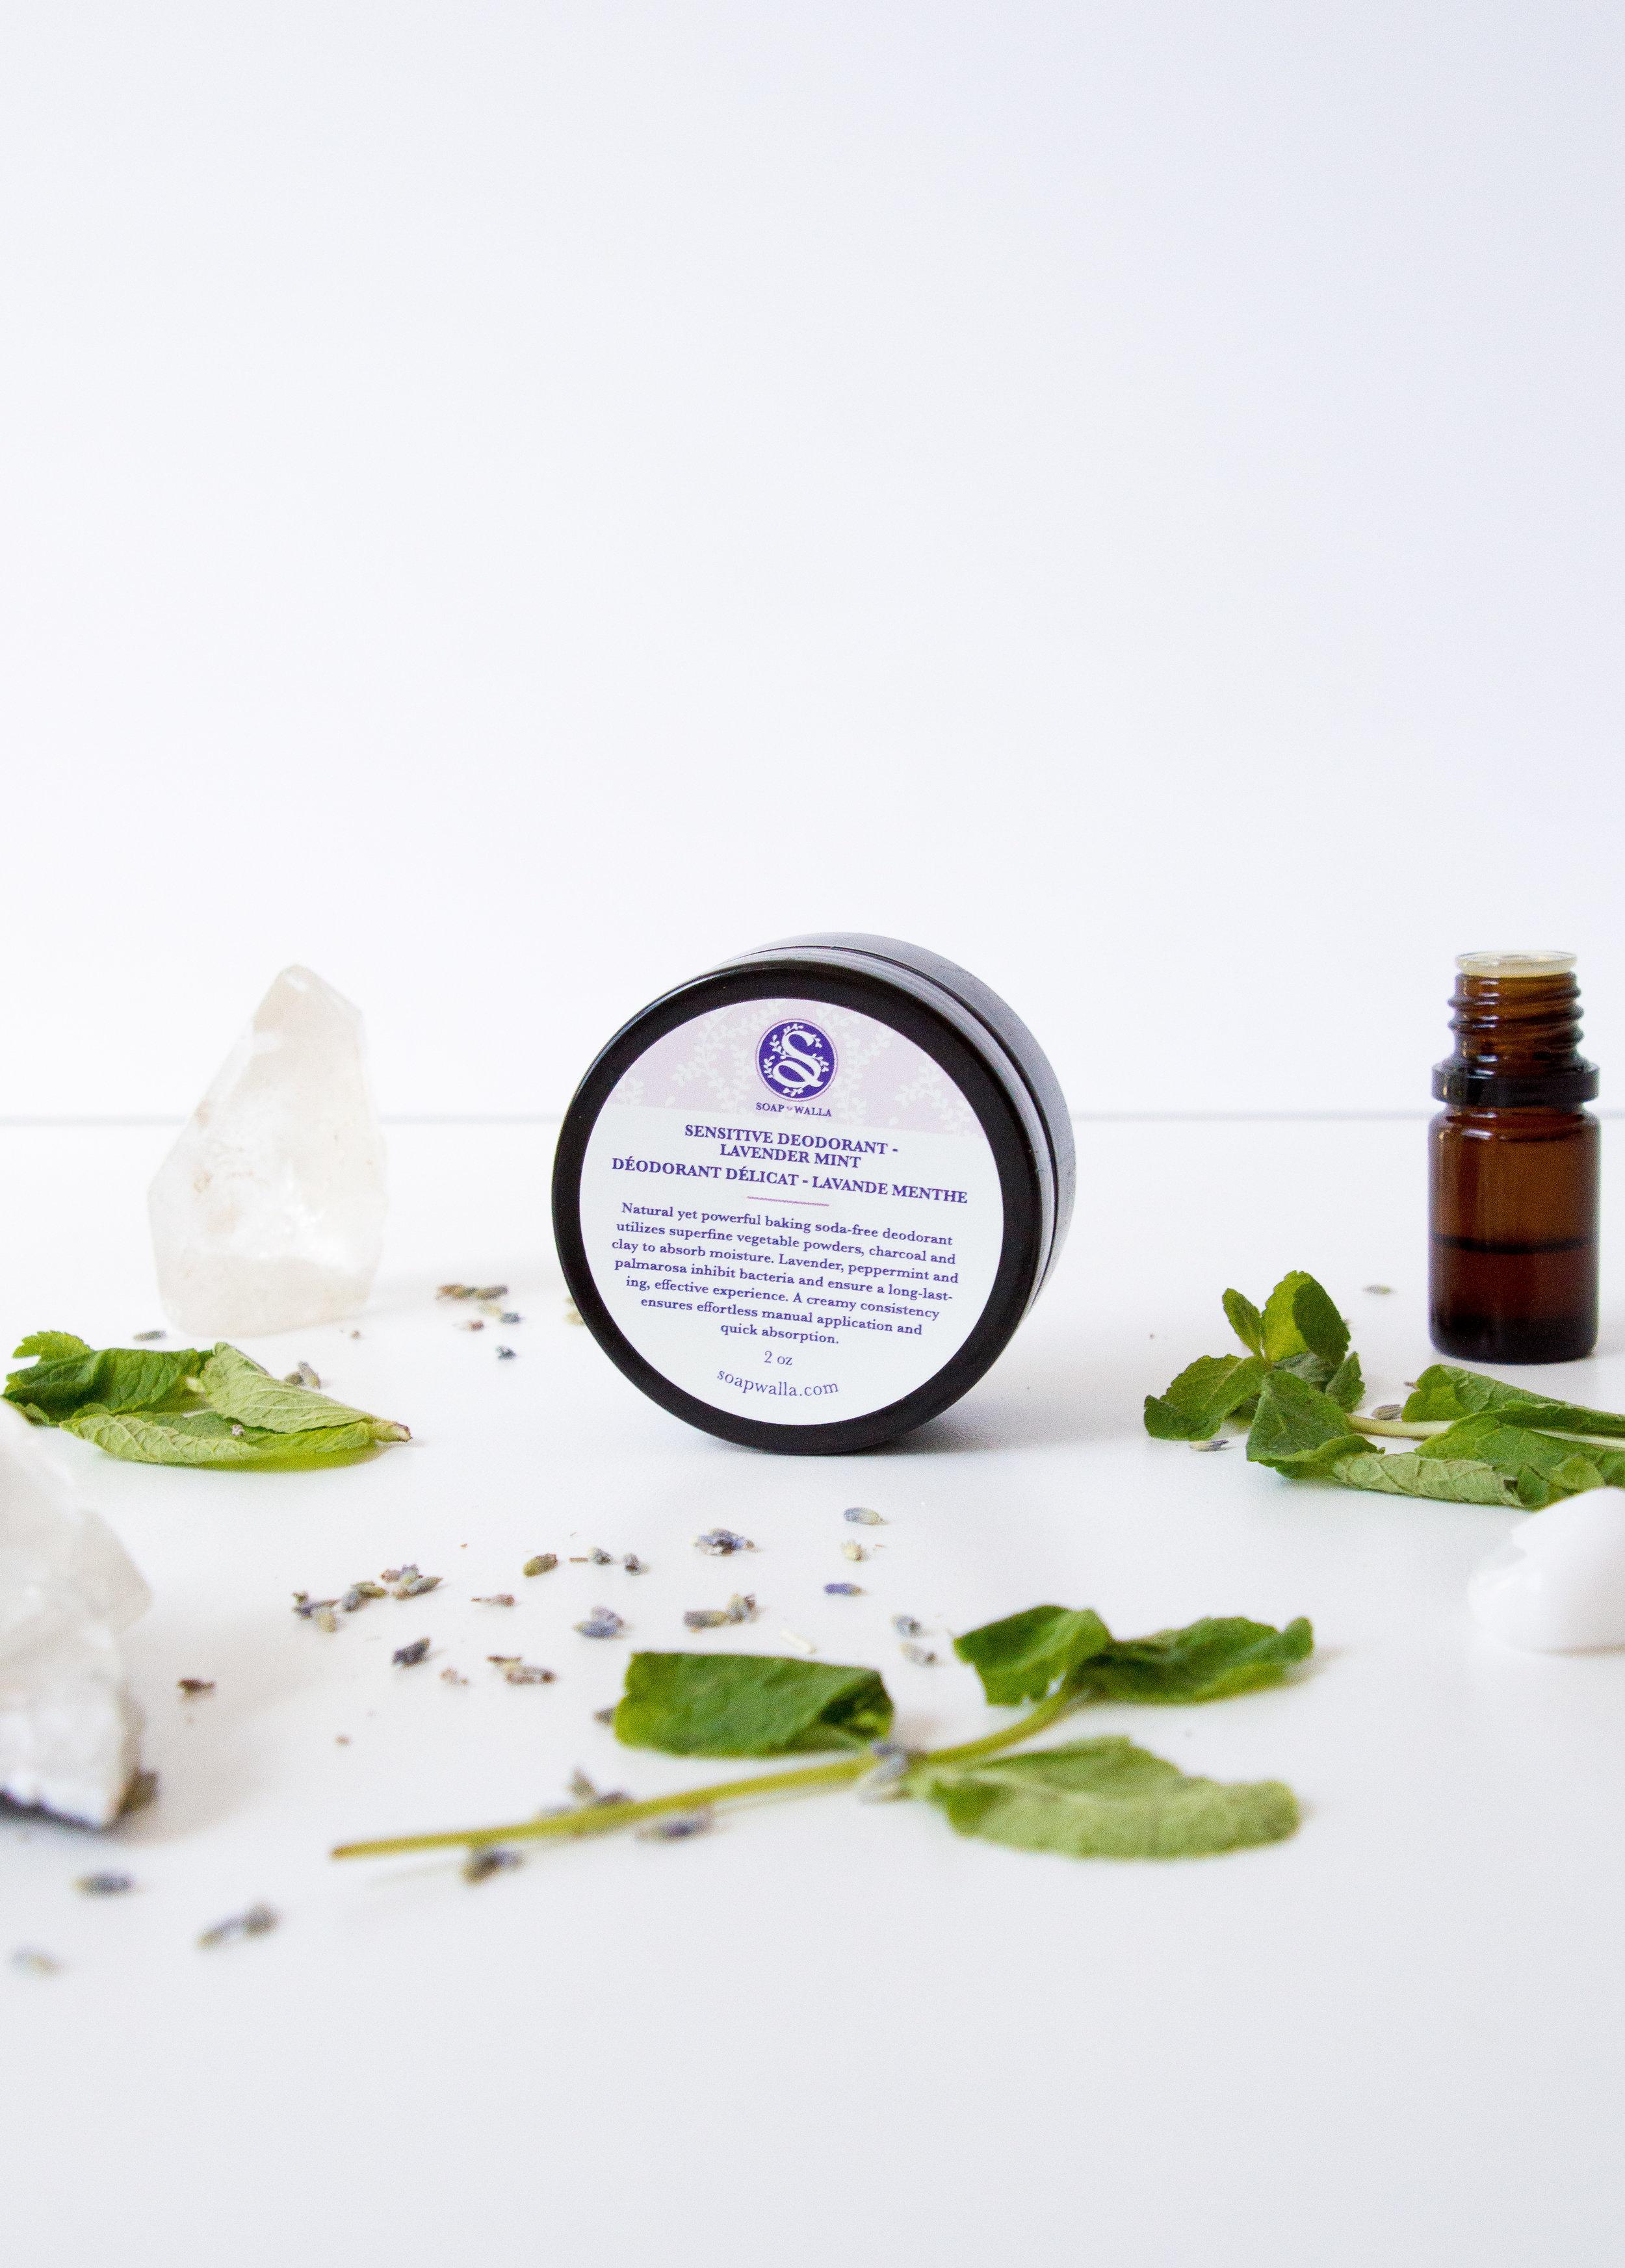 Soapwalla Sensitive Skin Deodorant Cream Review